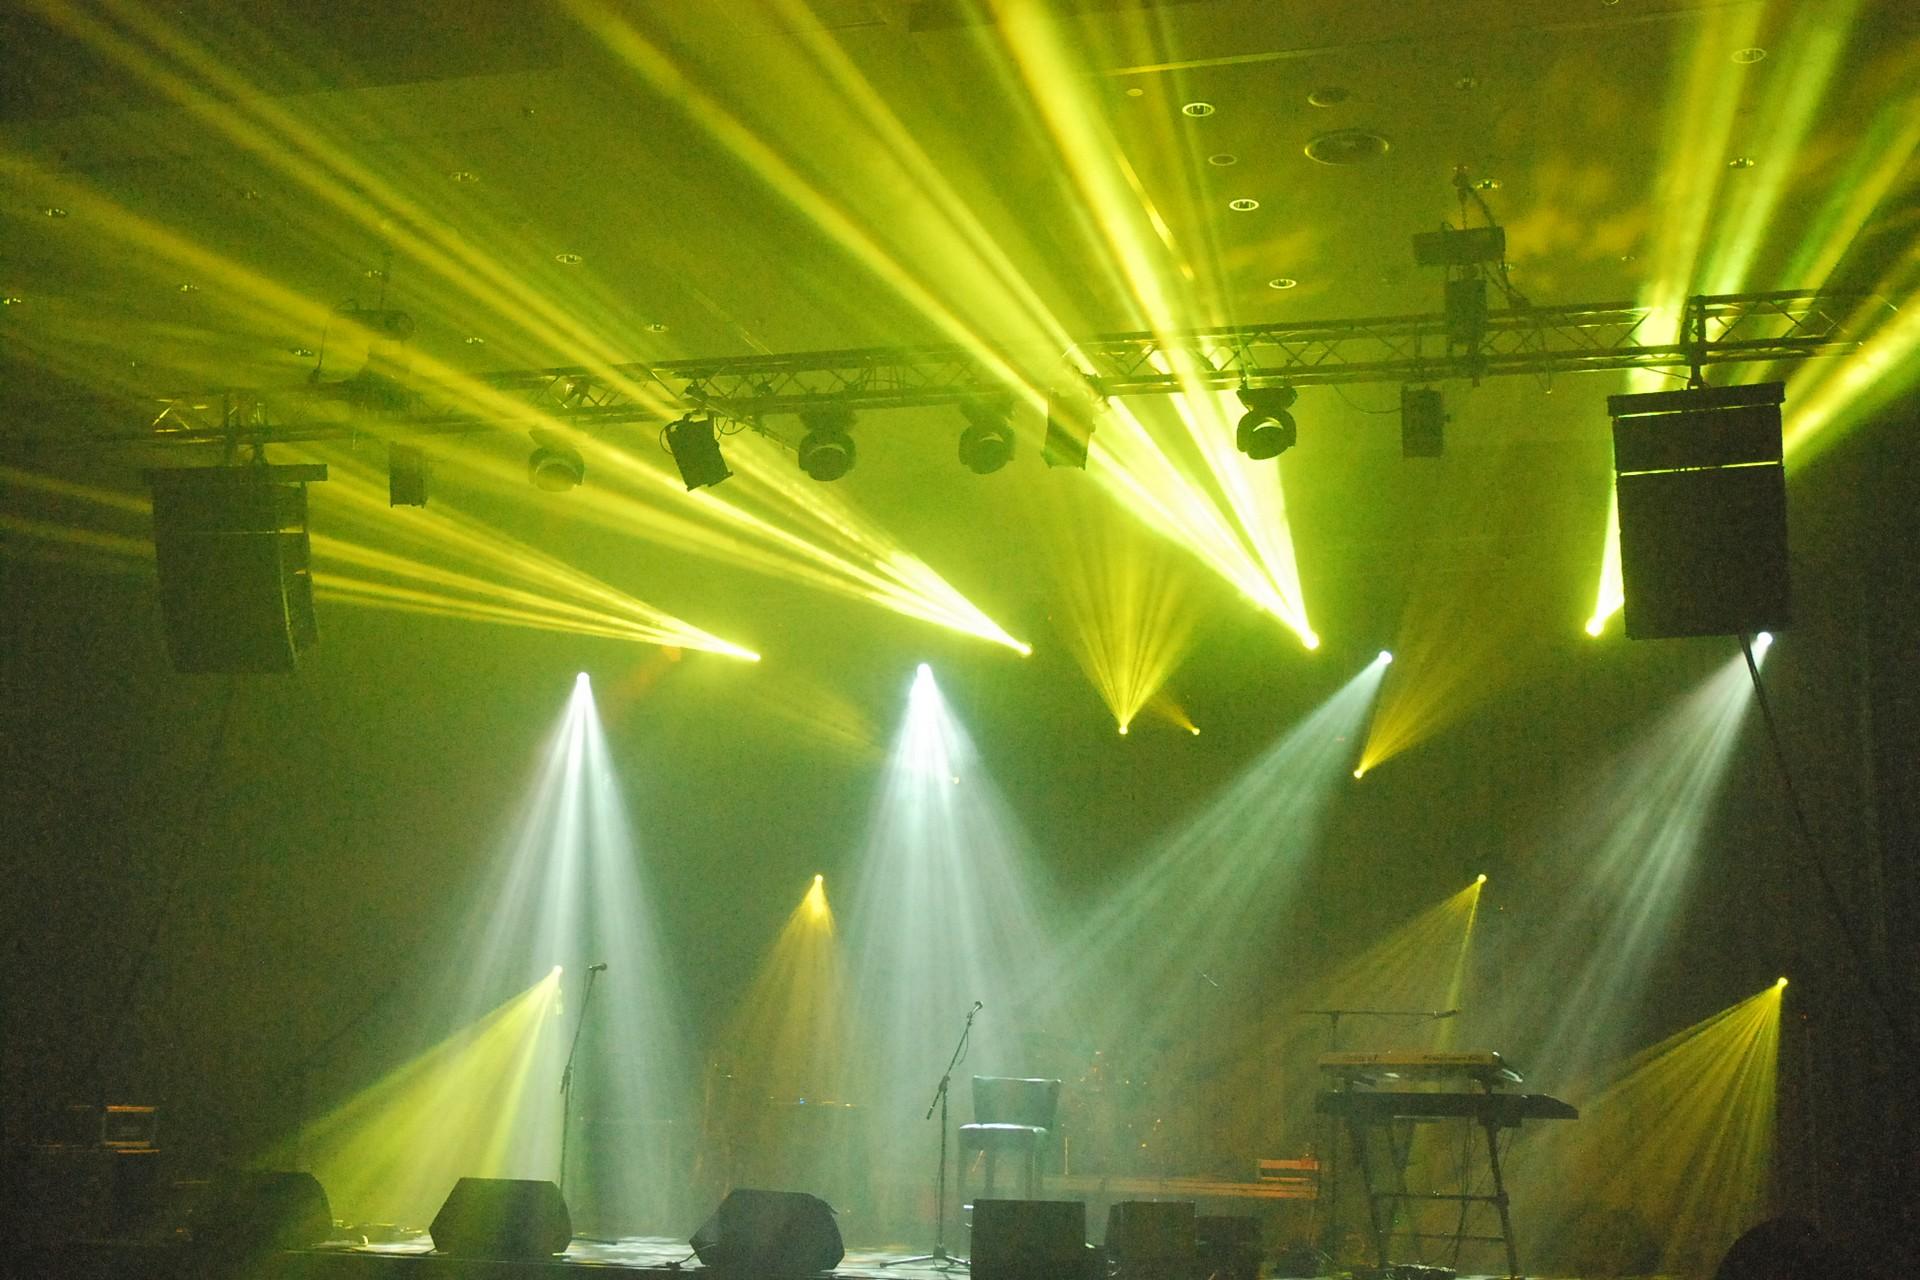 Oświetlene koncertu Gdańsk